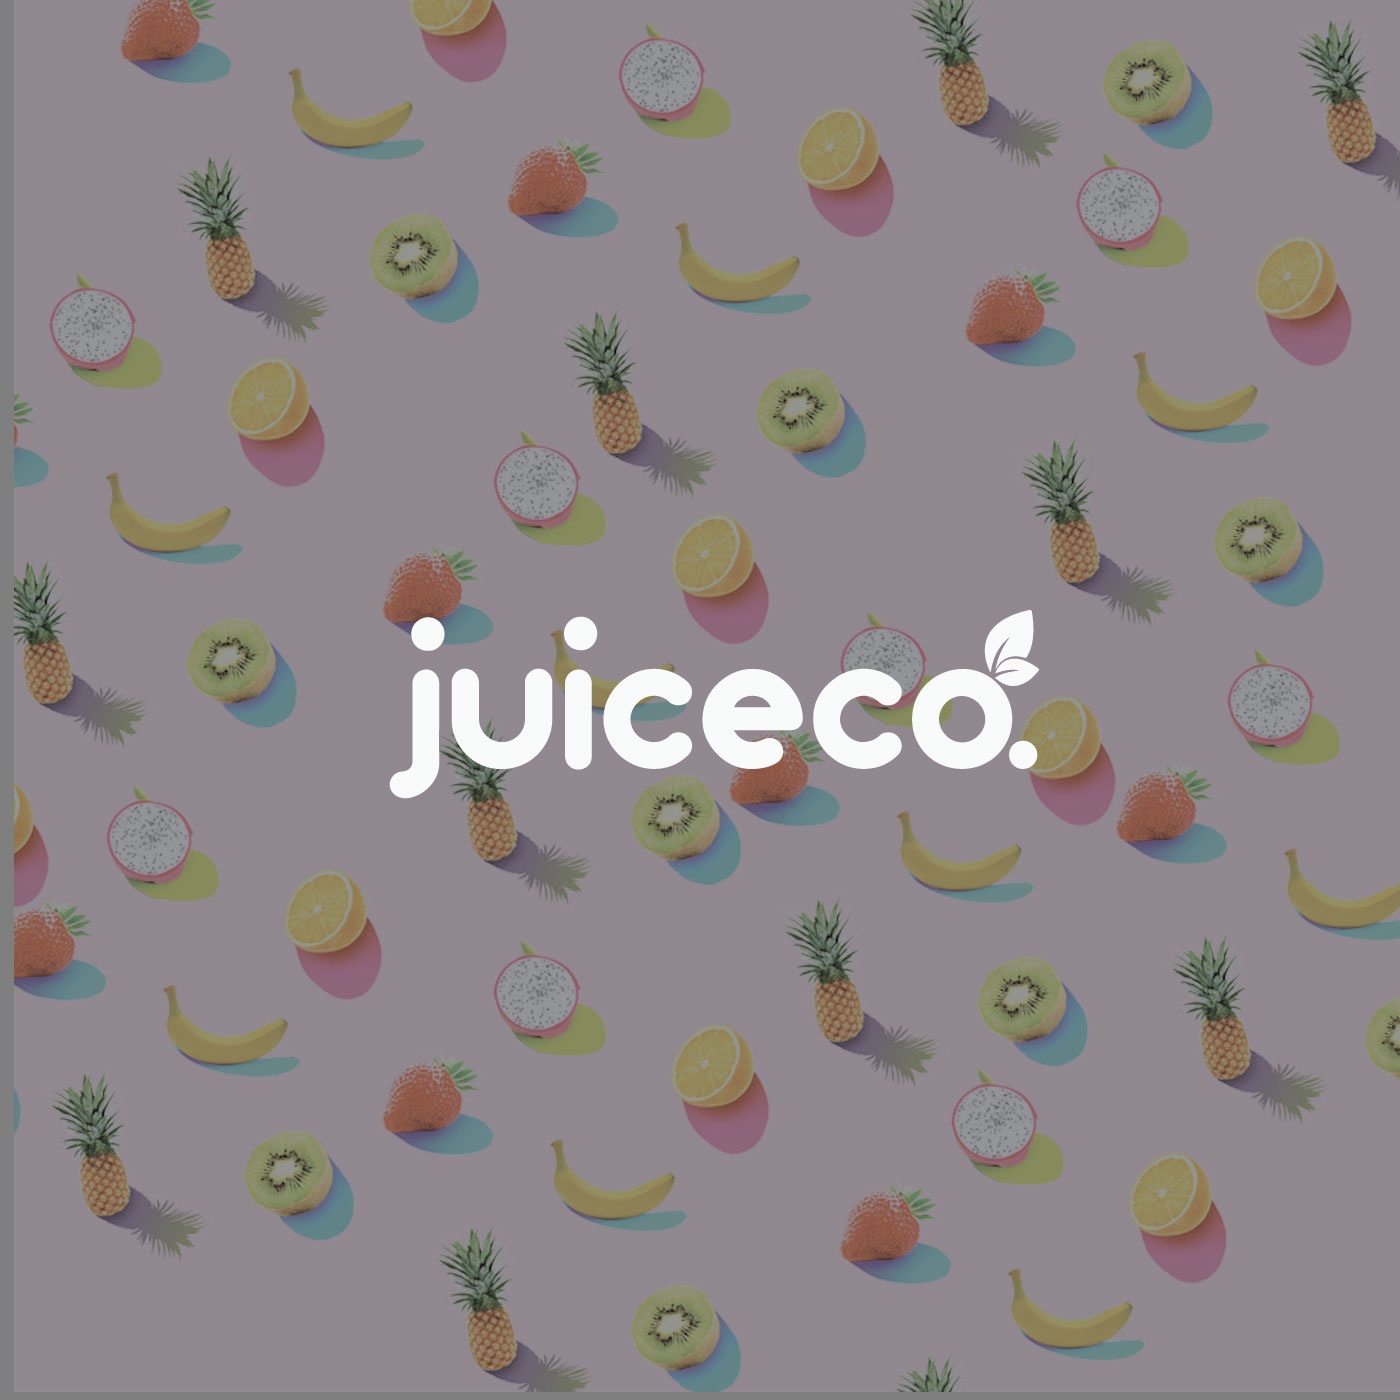 juiceco-square